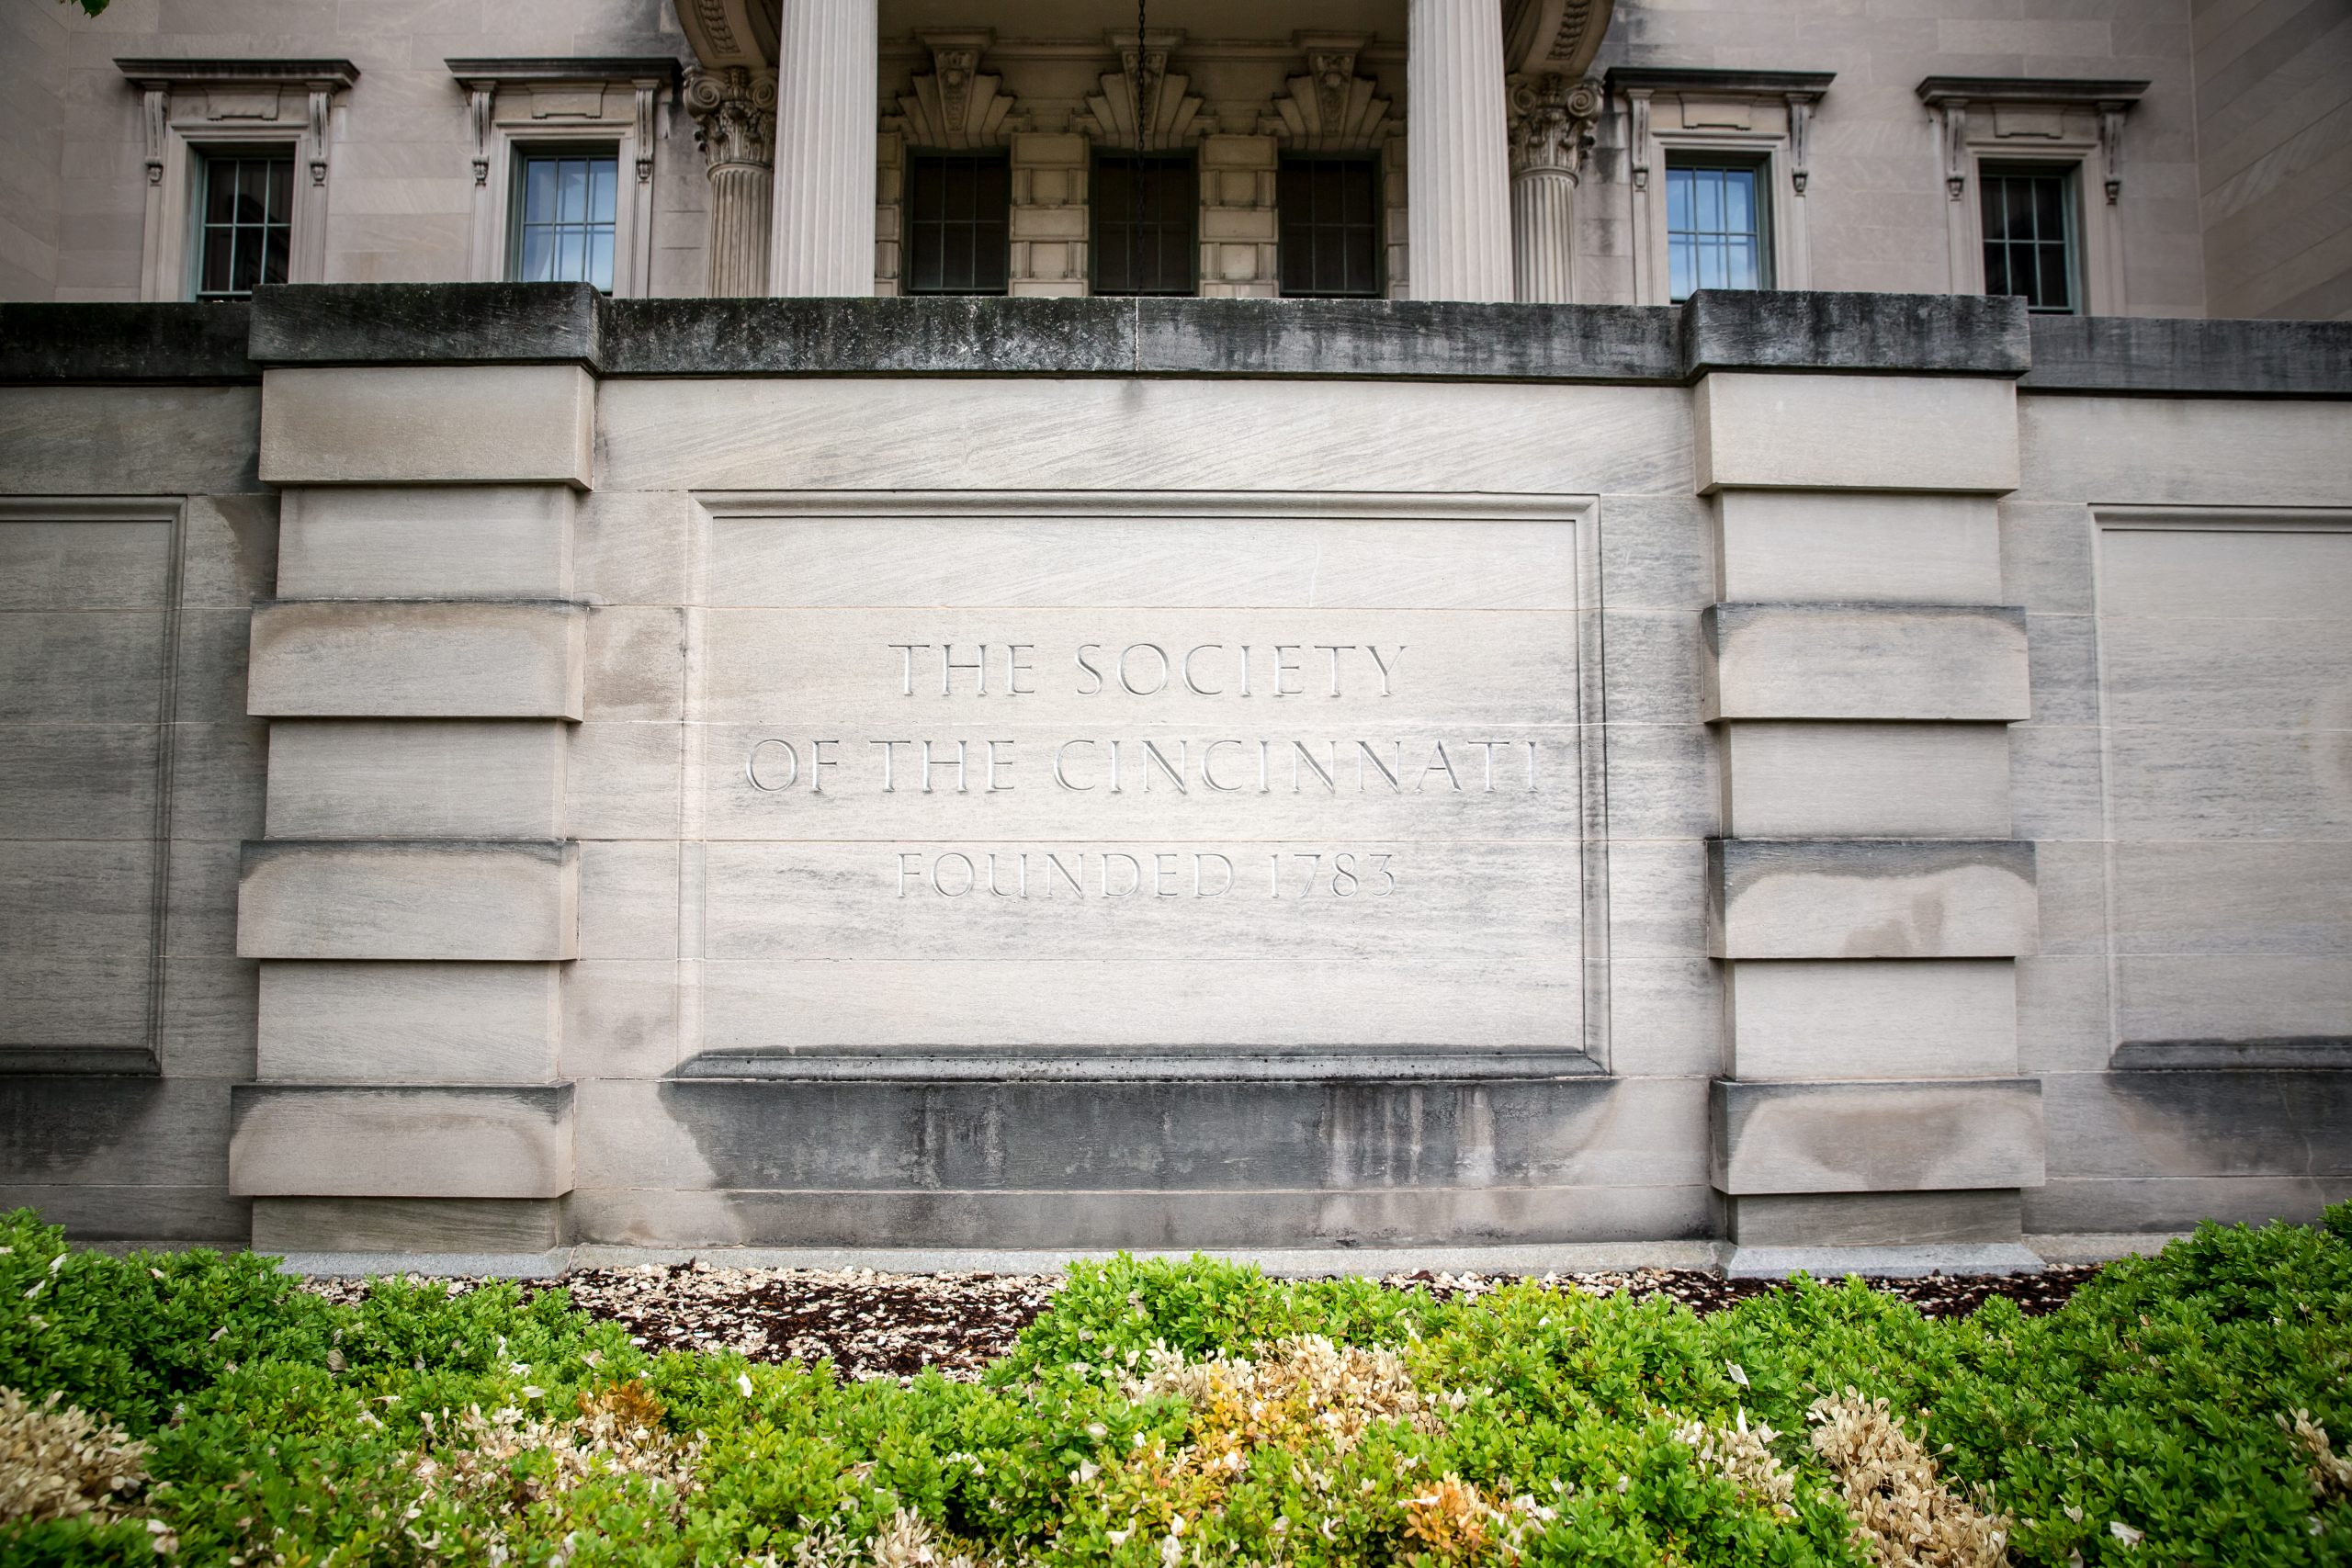 Massachusetts Avenue entrance. Photo by Nick Tettey.